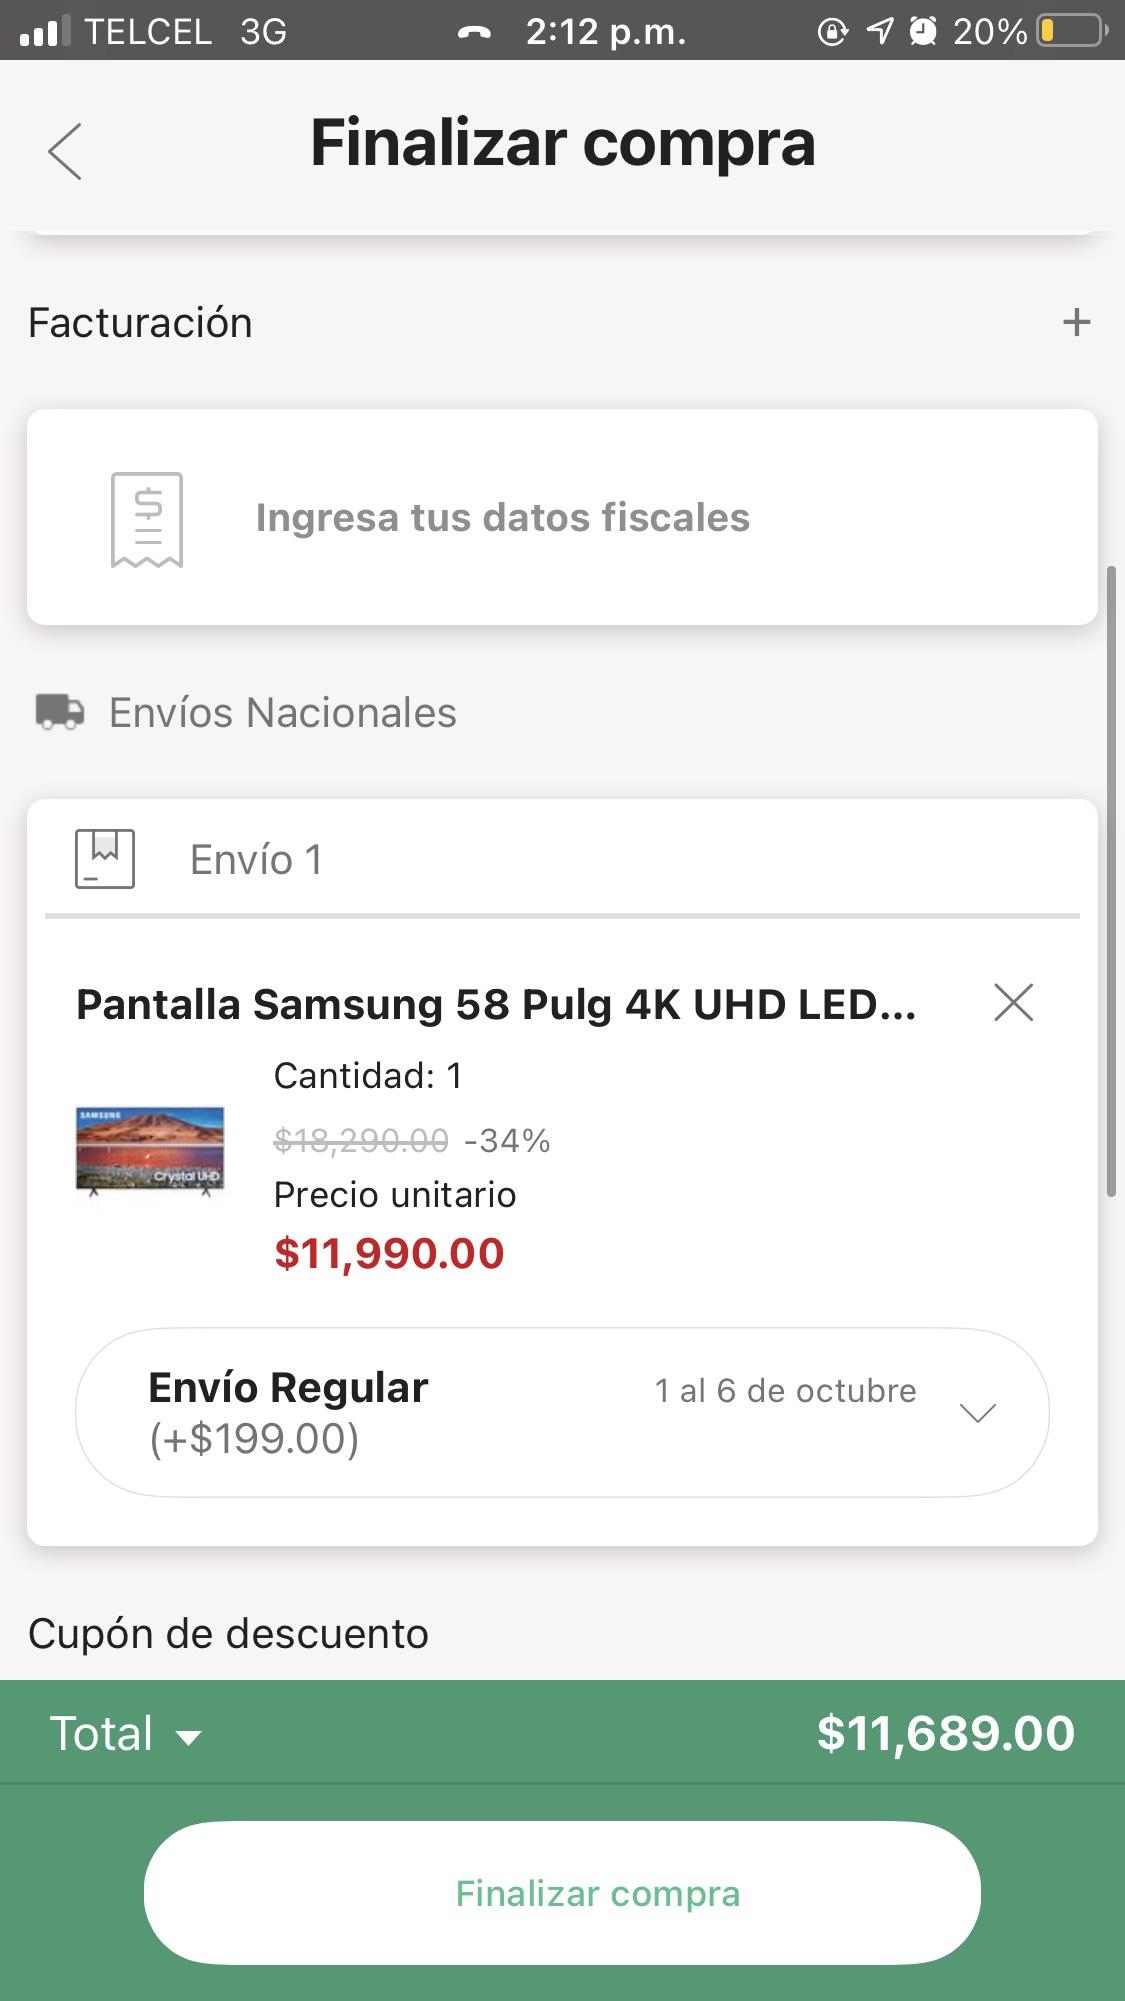 Linio: Pantalla Samsung 58 Pulg 4K UHD LED Smart TV co